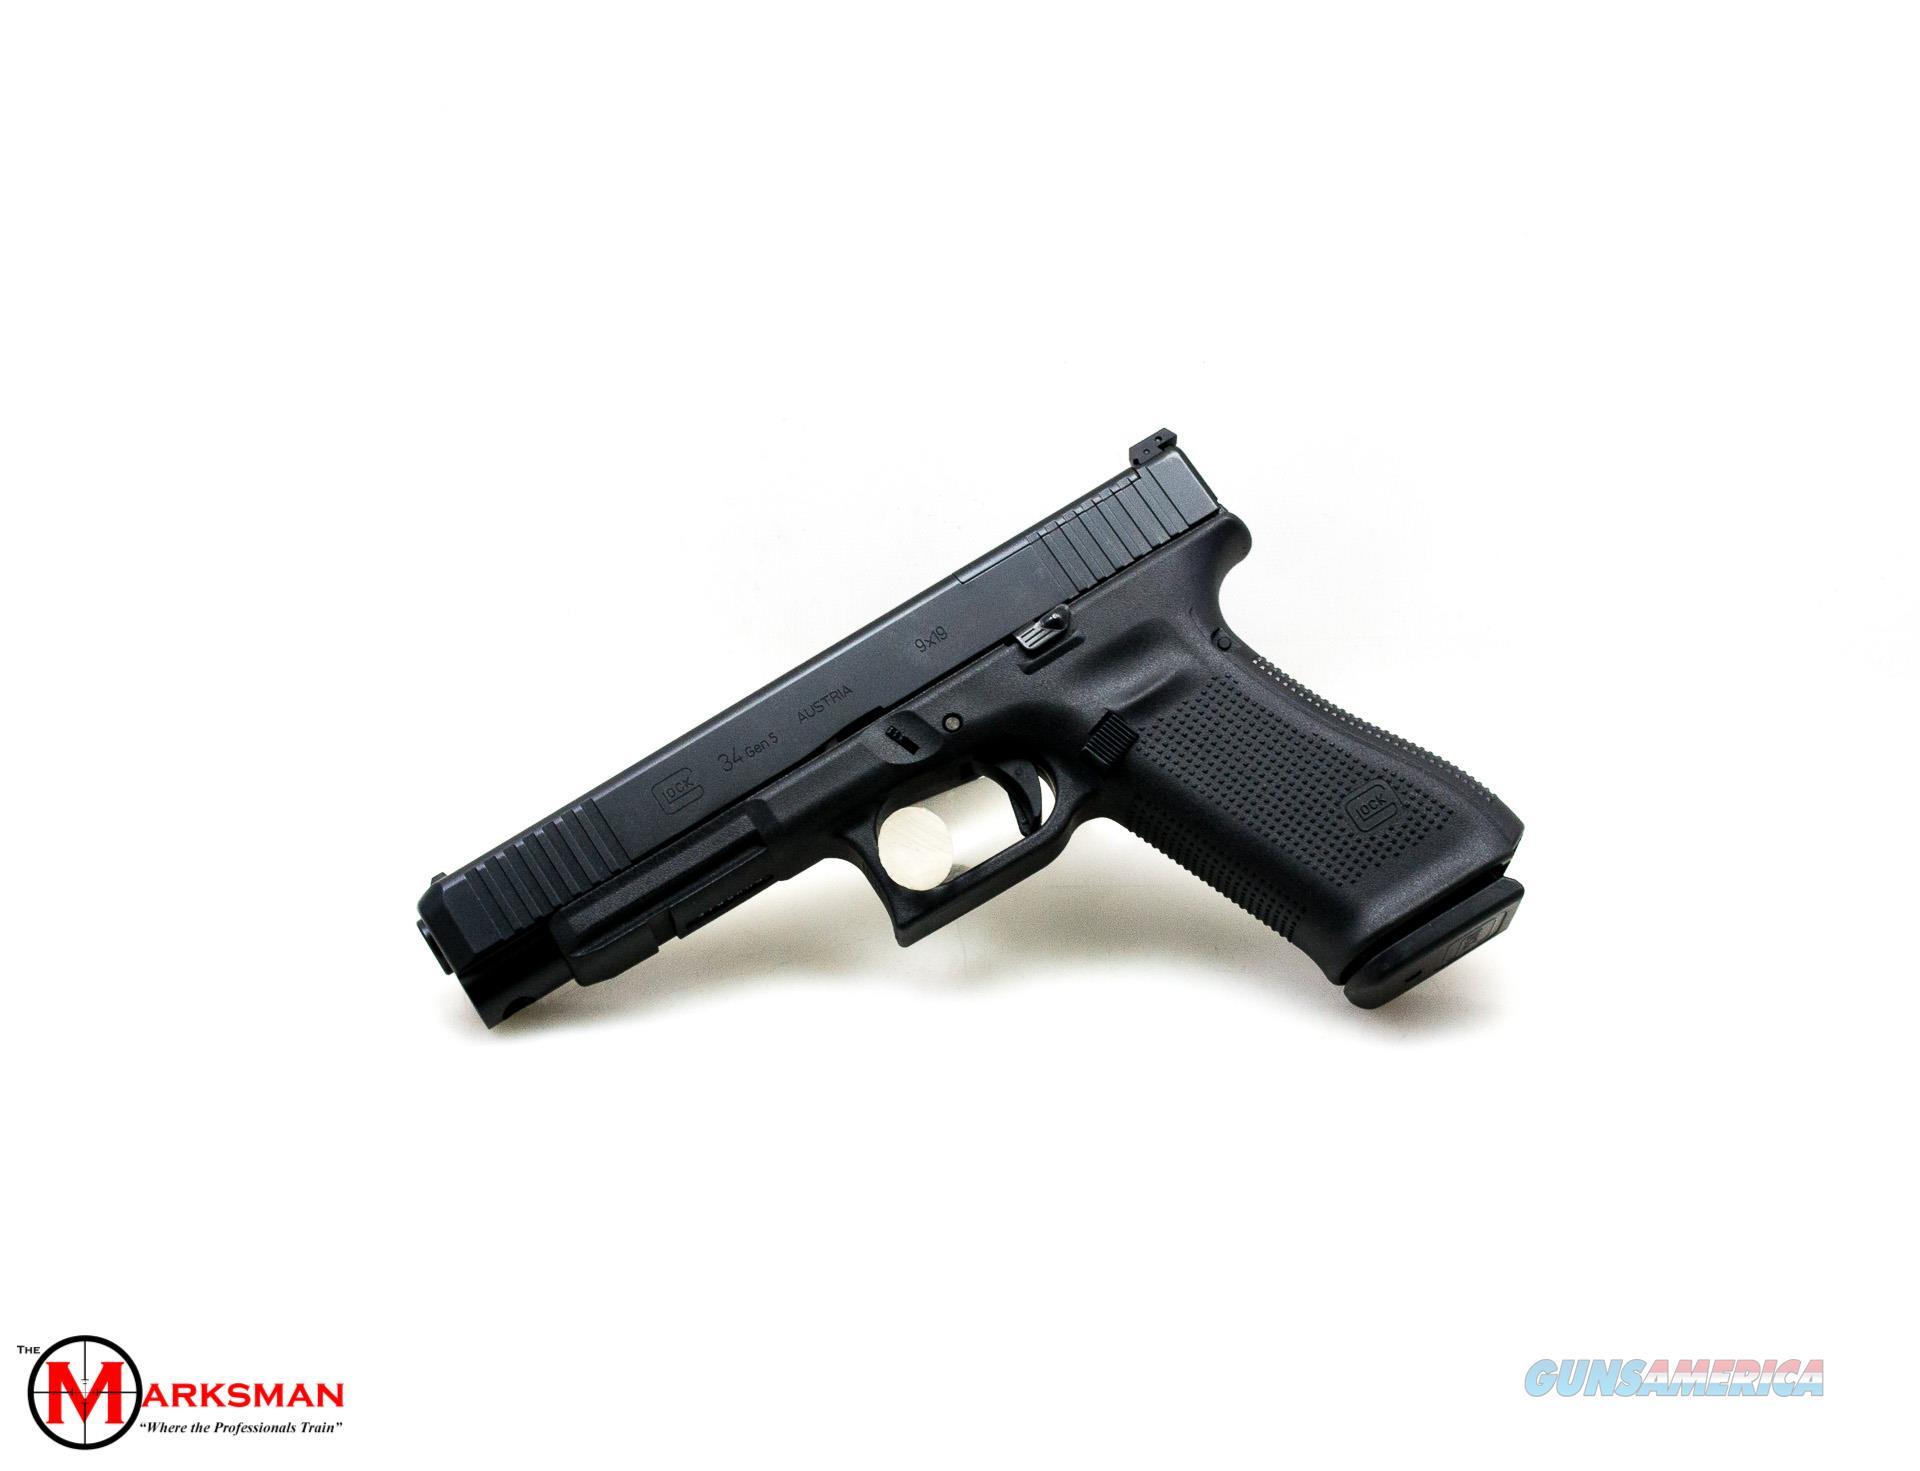 Glock 34 Generation 5 MOS, 9mm, Front Serrations NEW  Guns > Pistols > Glock Pistols > 34